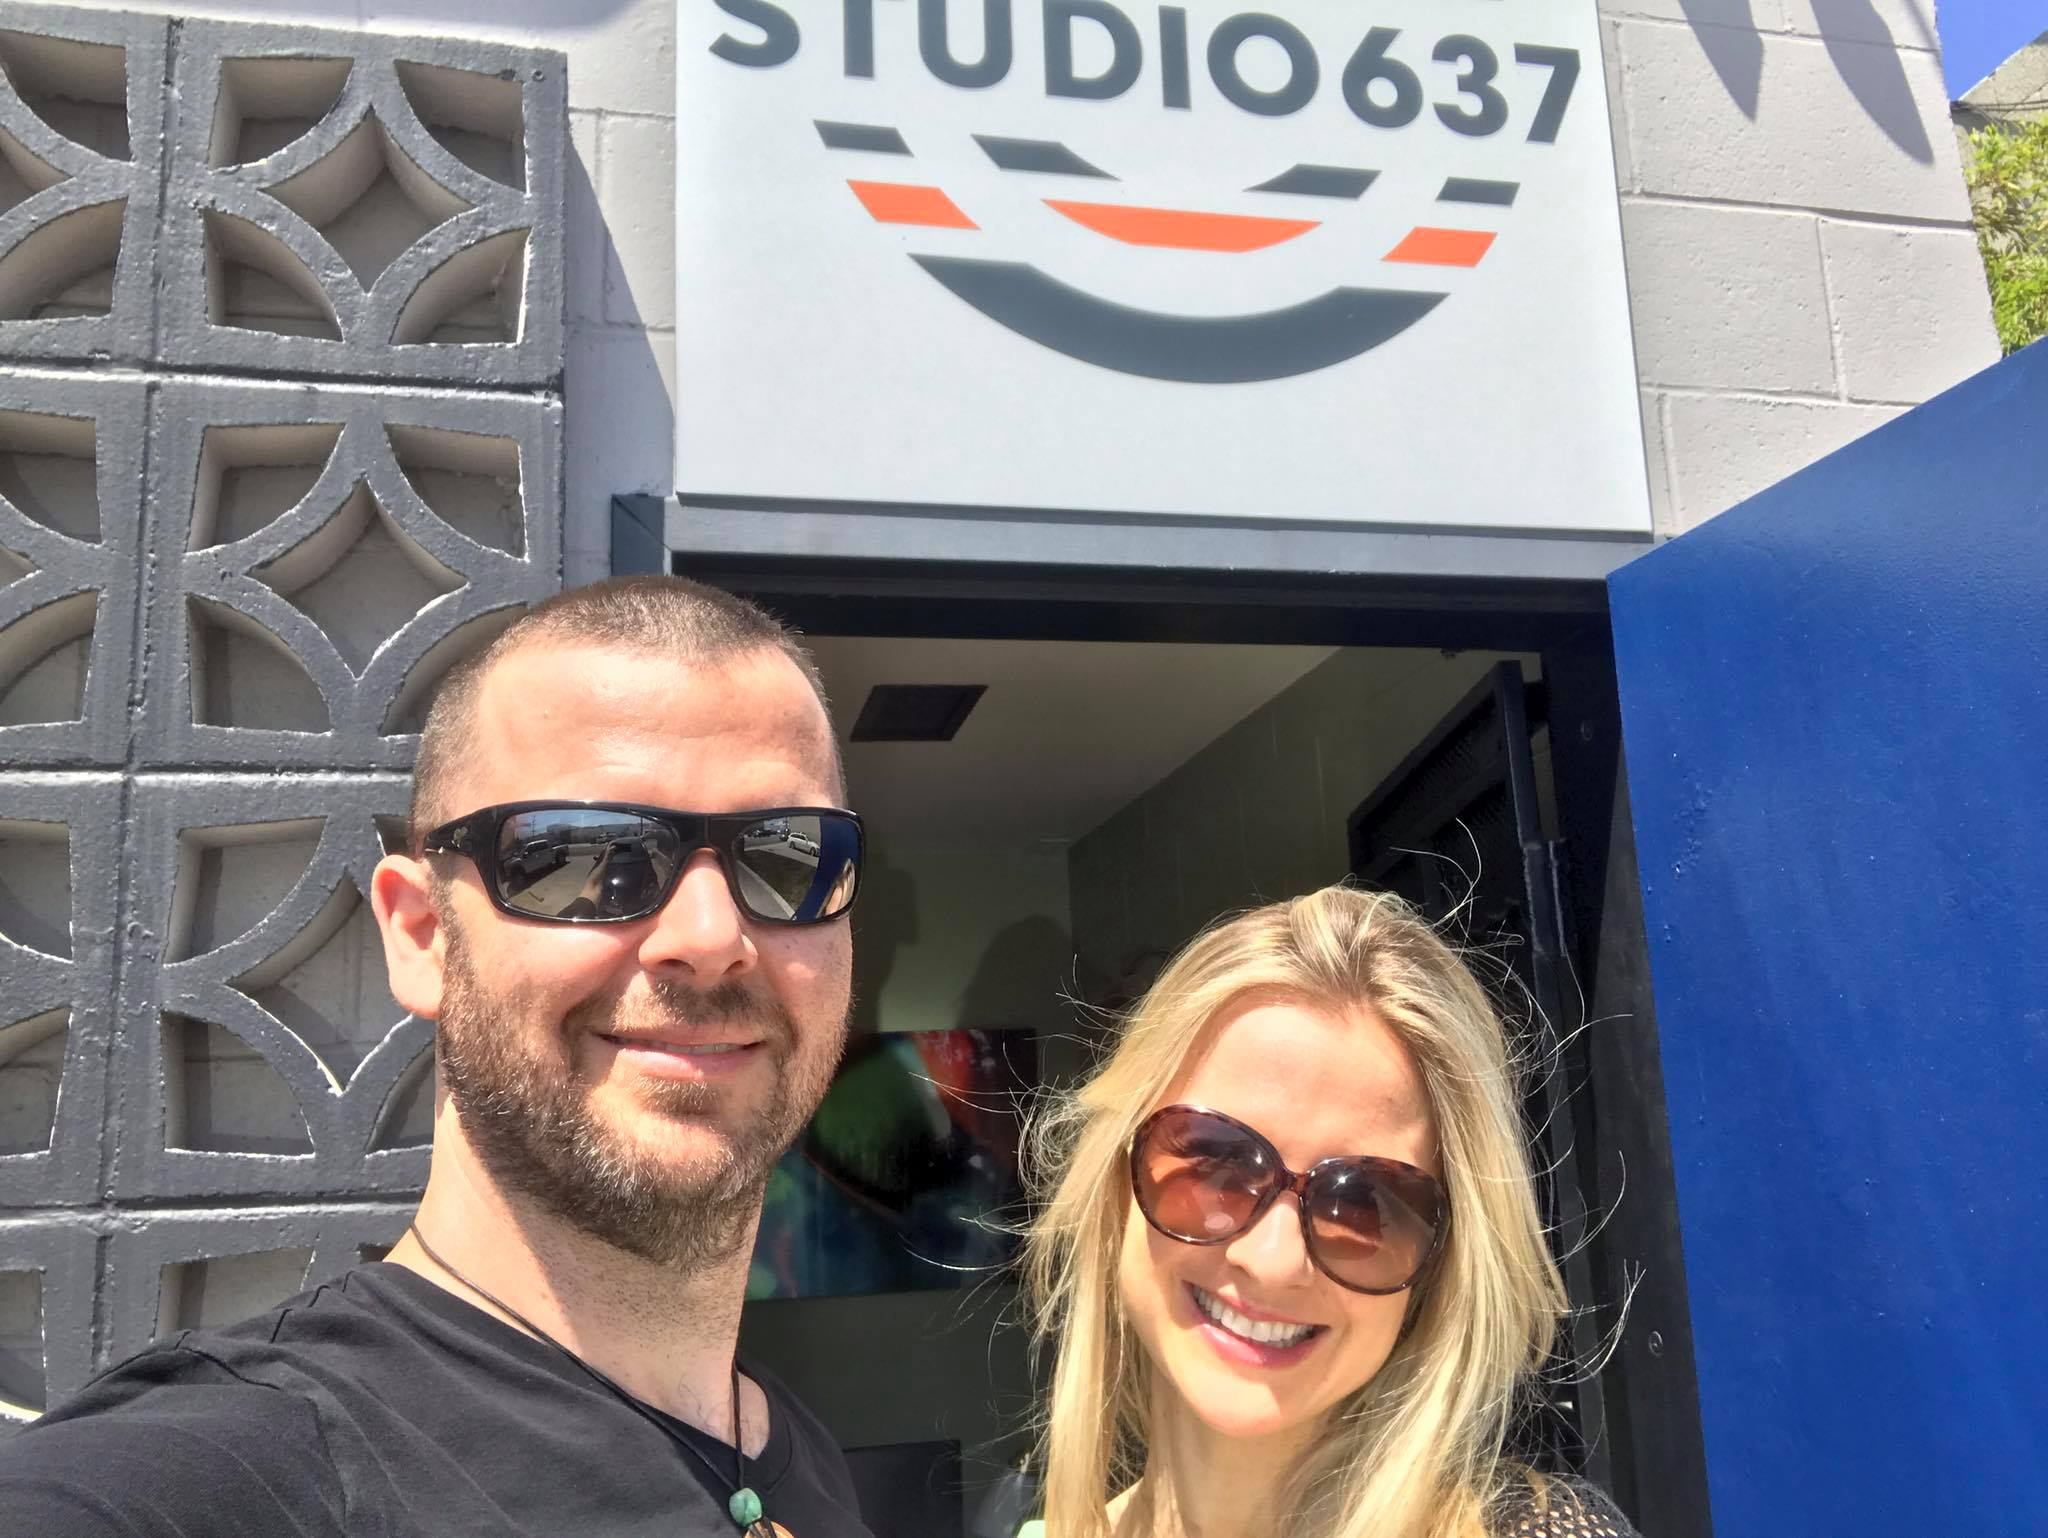 Jason-Robin-Studio 637.jpg